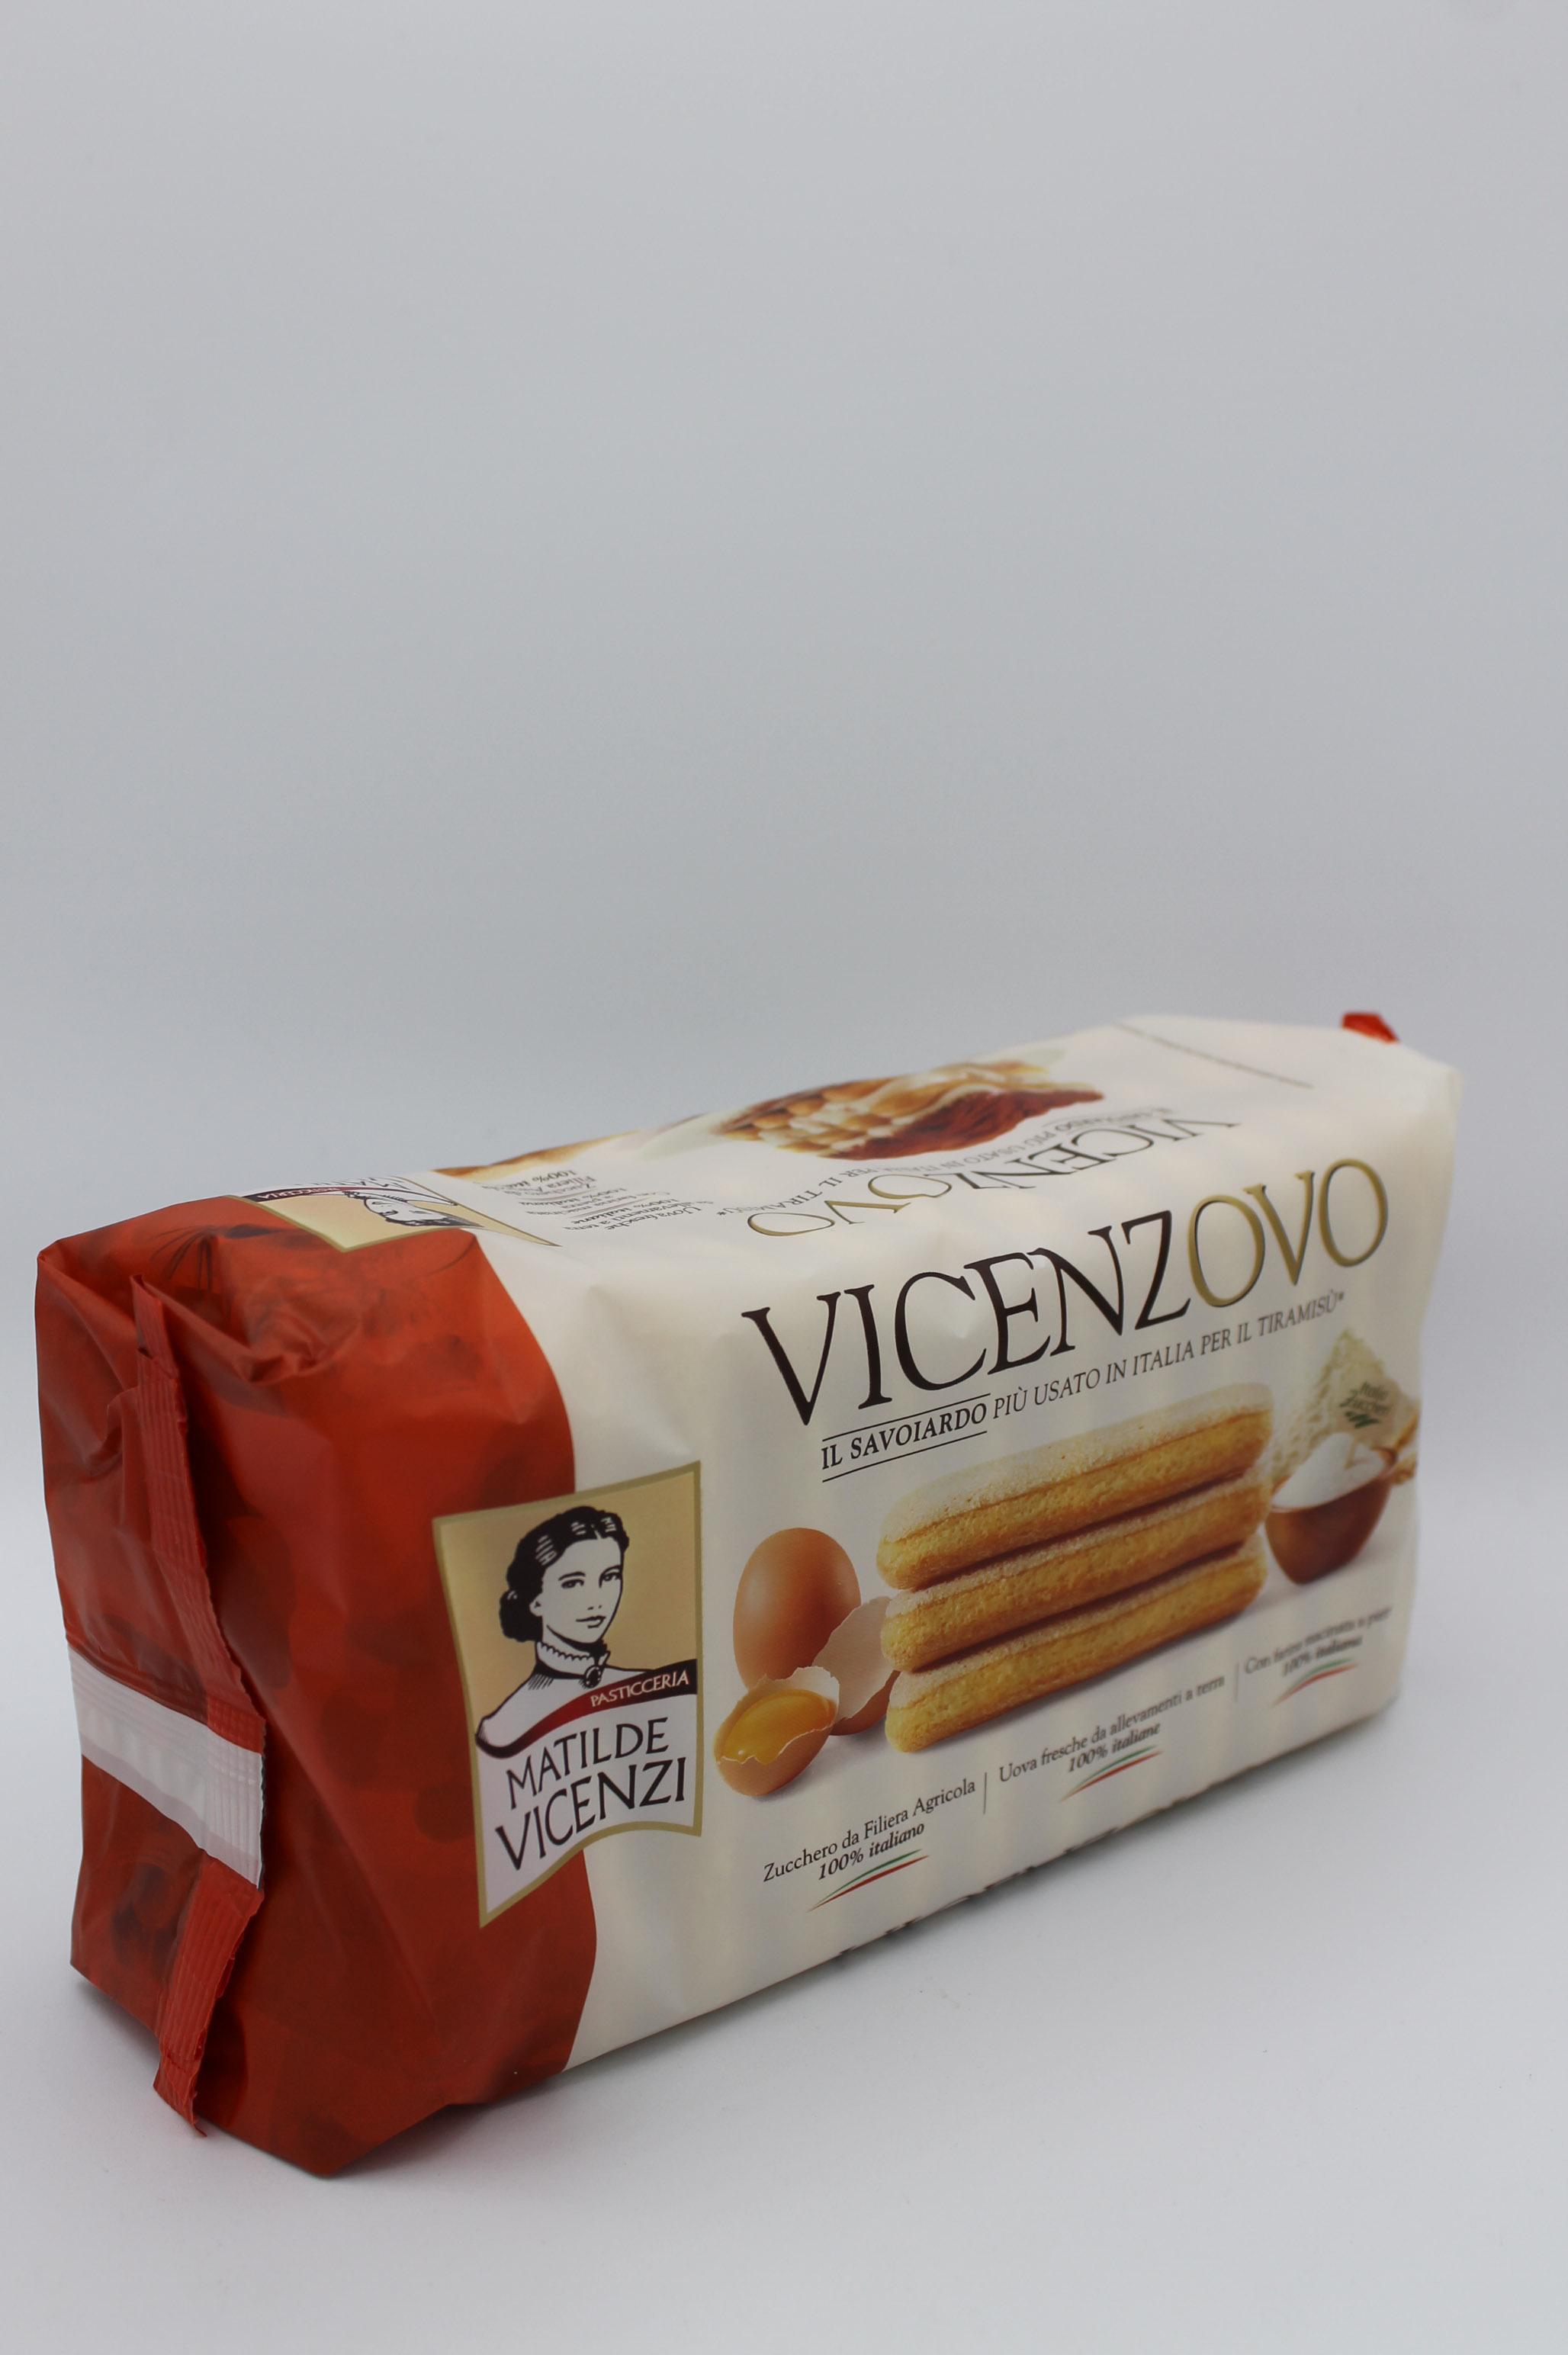 Vicenzovo savoiardi 300 gr.